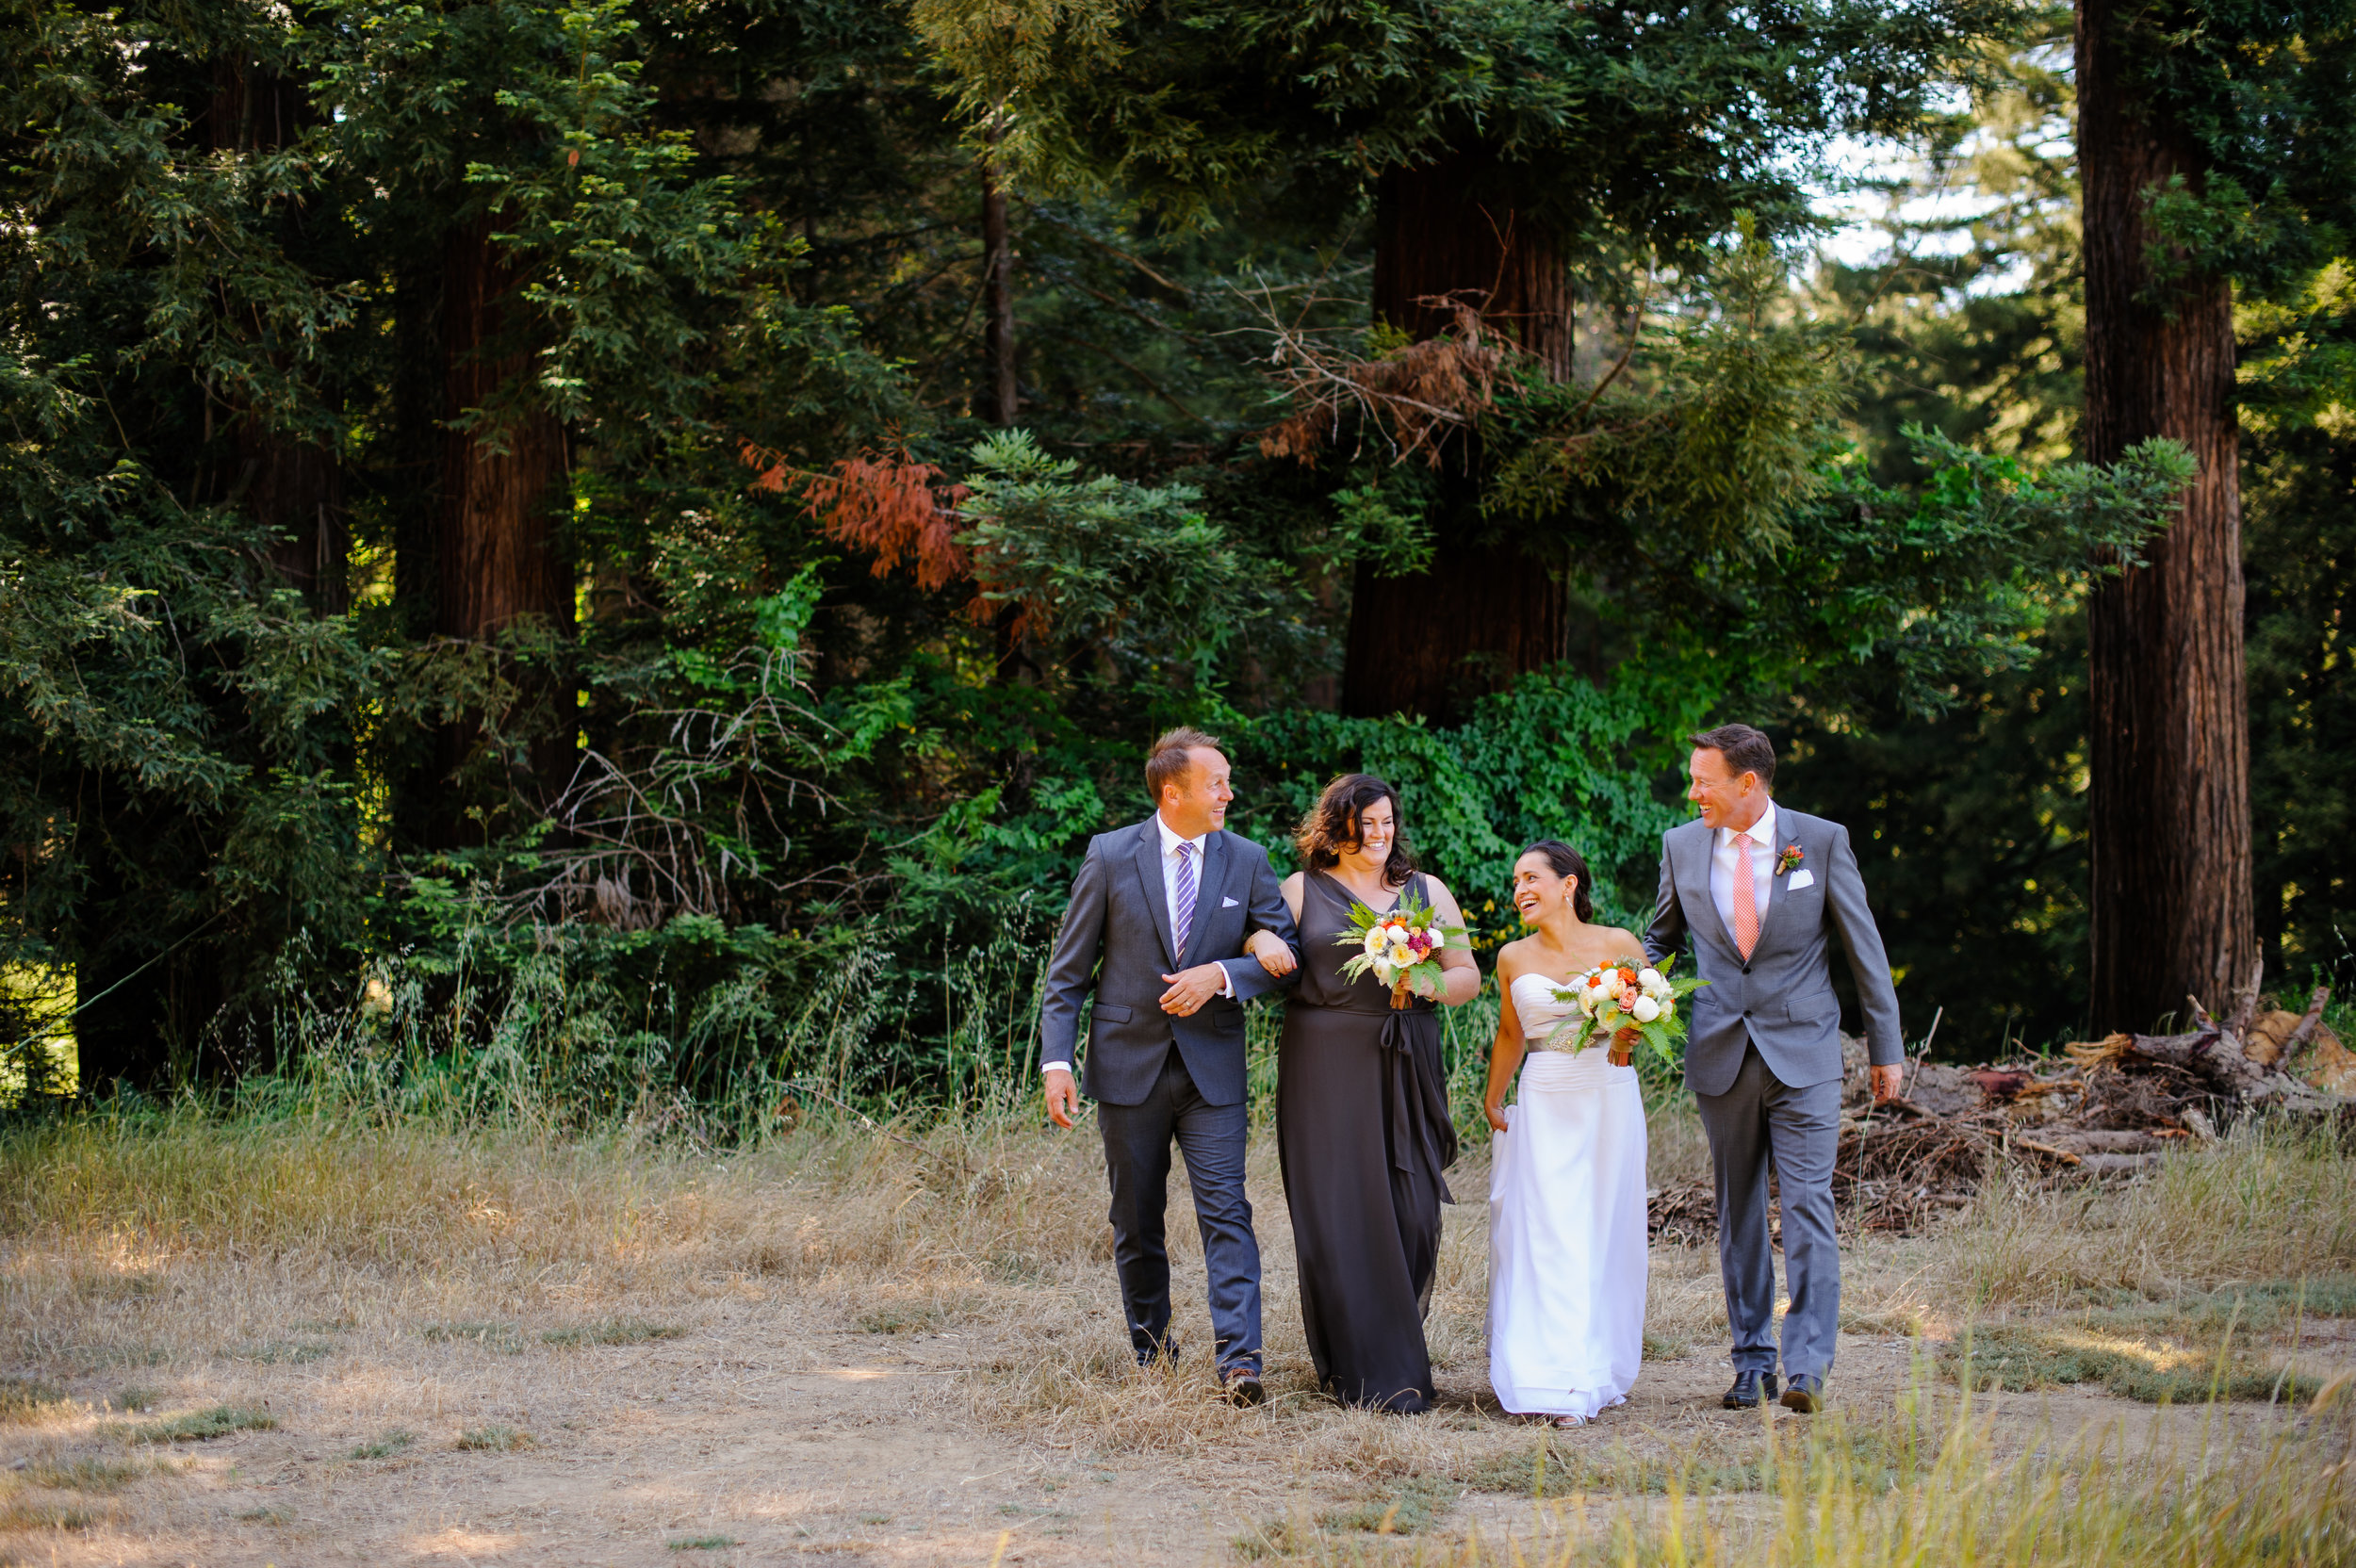 janet-jeremy-009-mountain-terrace-woodside-wedding-photographer-katherine-nicole-photography.JPG